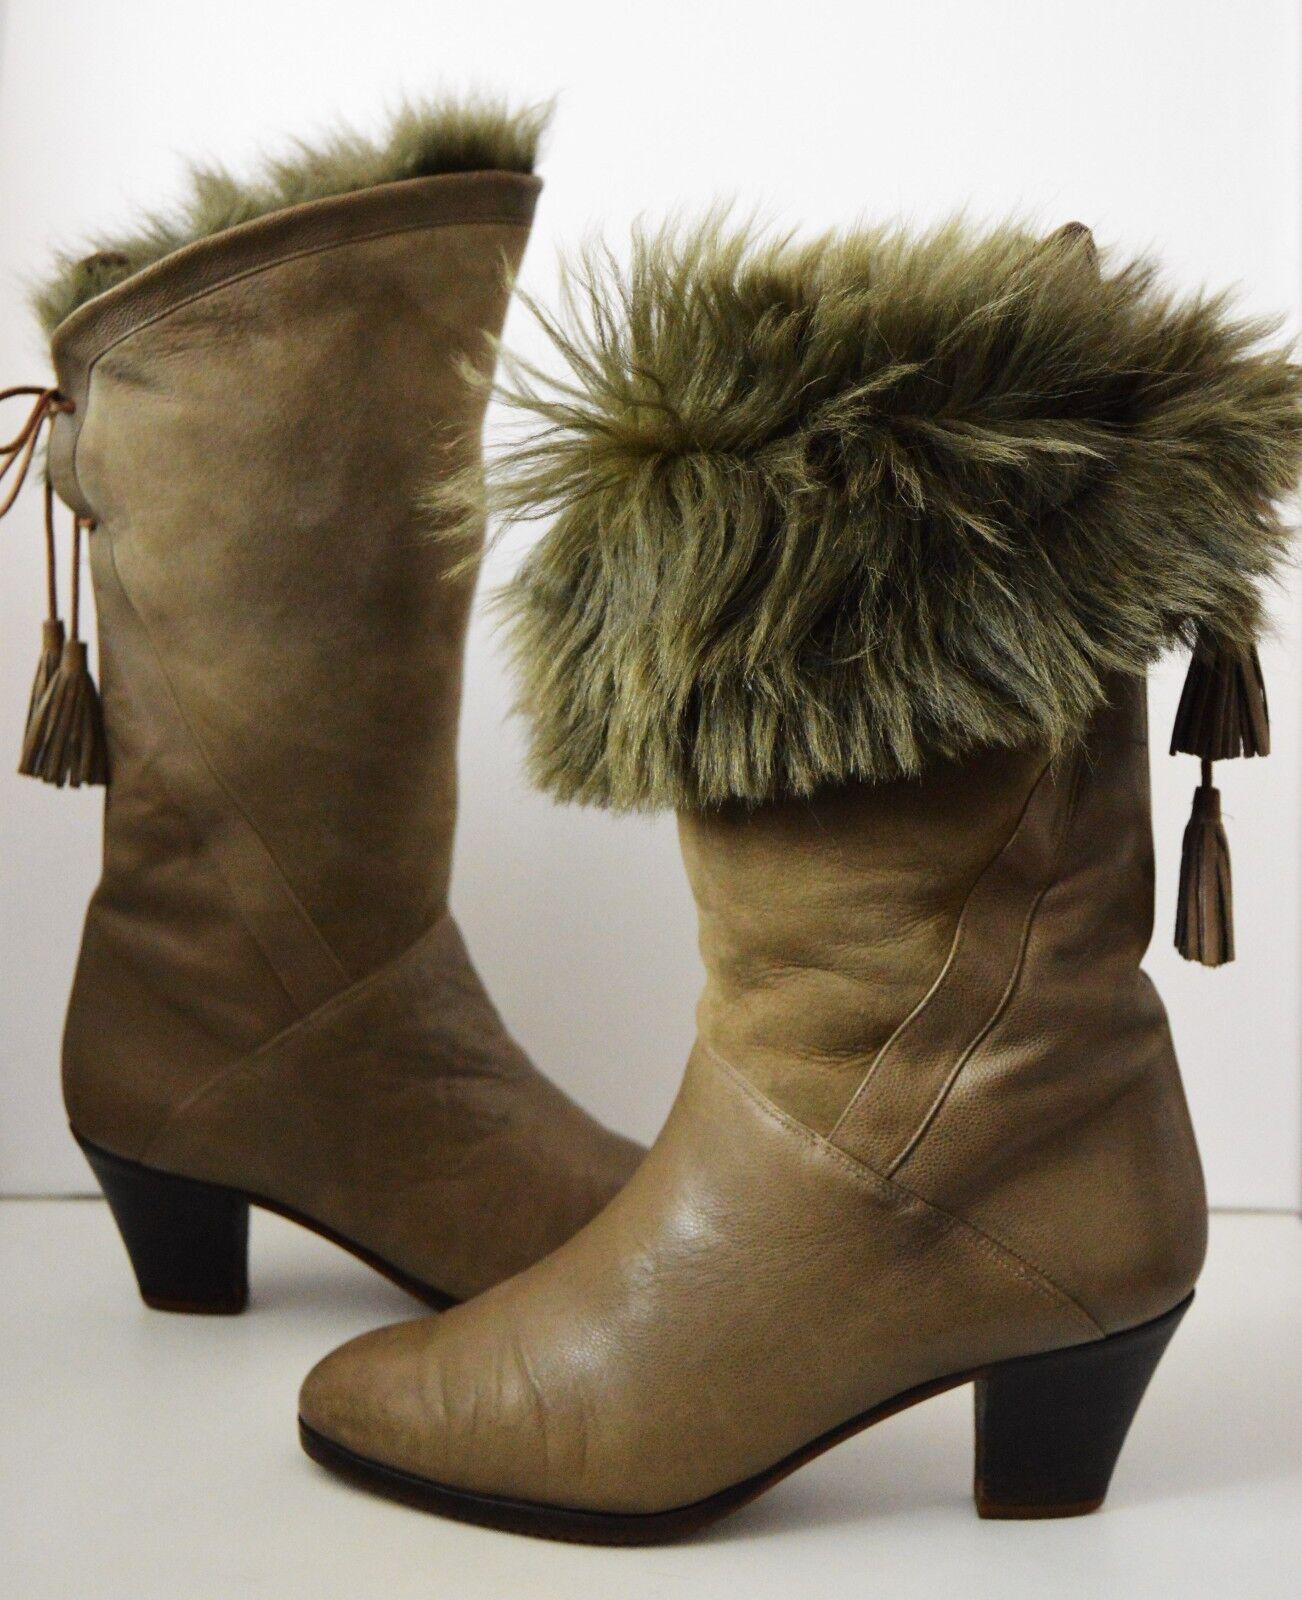 Stiefel alta moda BALDAN Fell Stiefel Stiefelette True Vintage 80er Winterstiefel